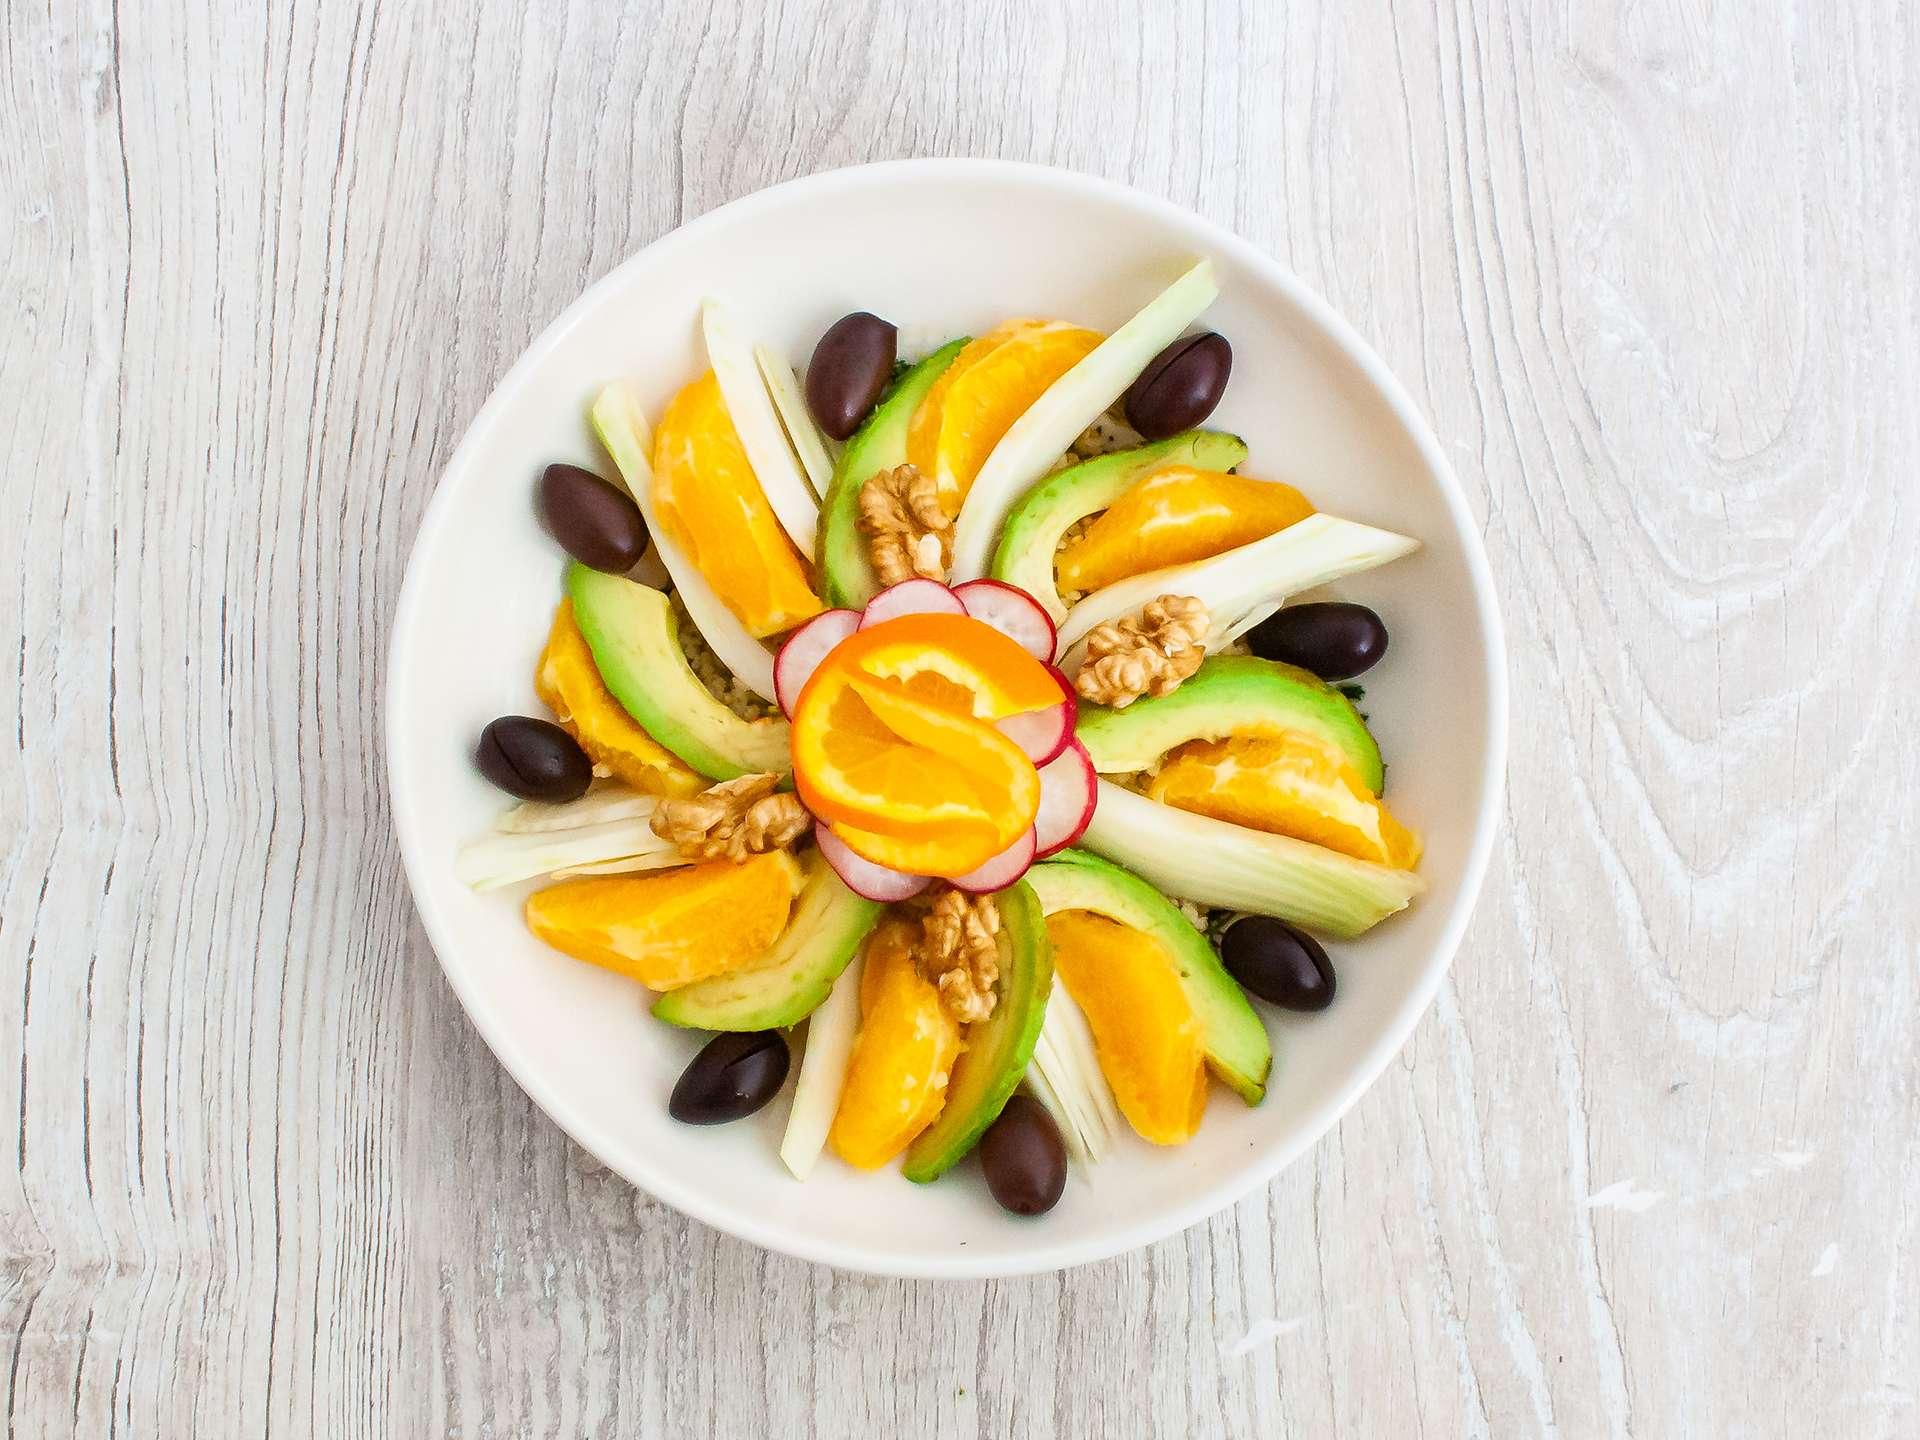 Step 3.2 of Sicilian Orange Salad with Fennel Avocado and Quinoa